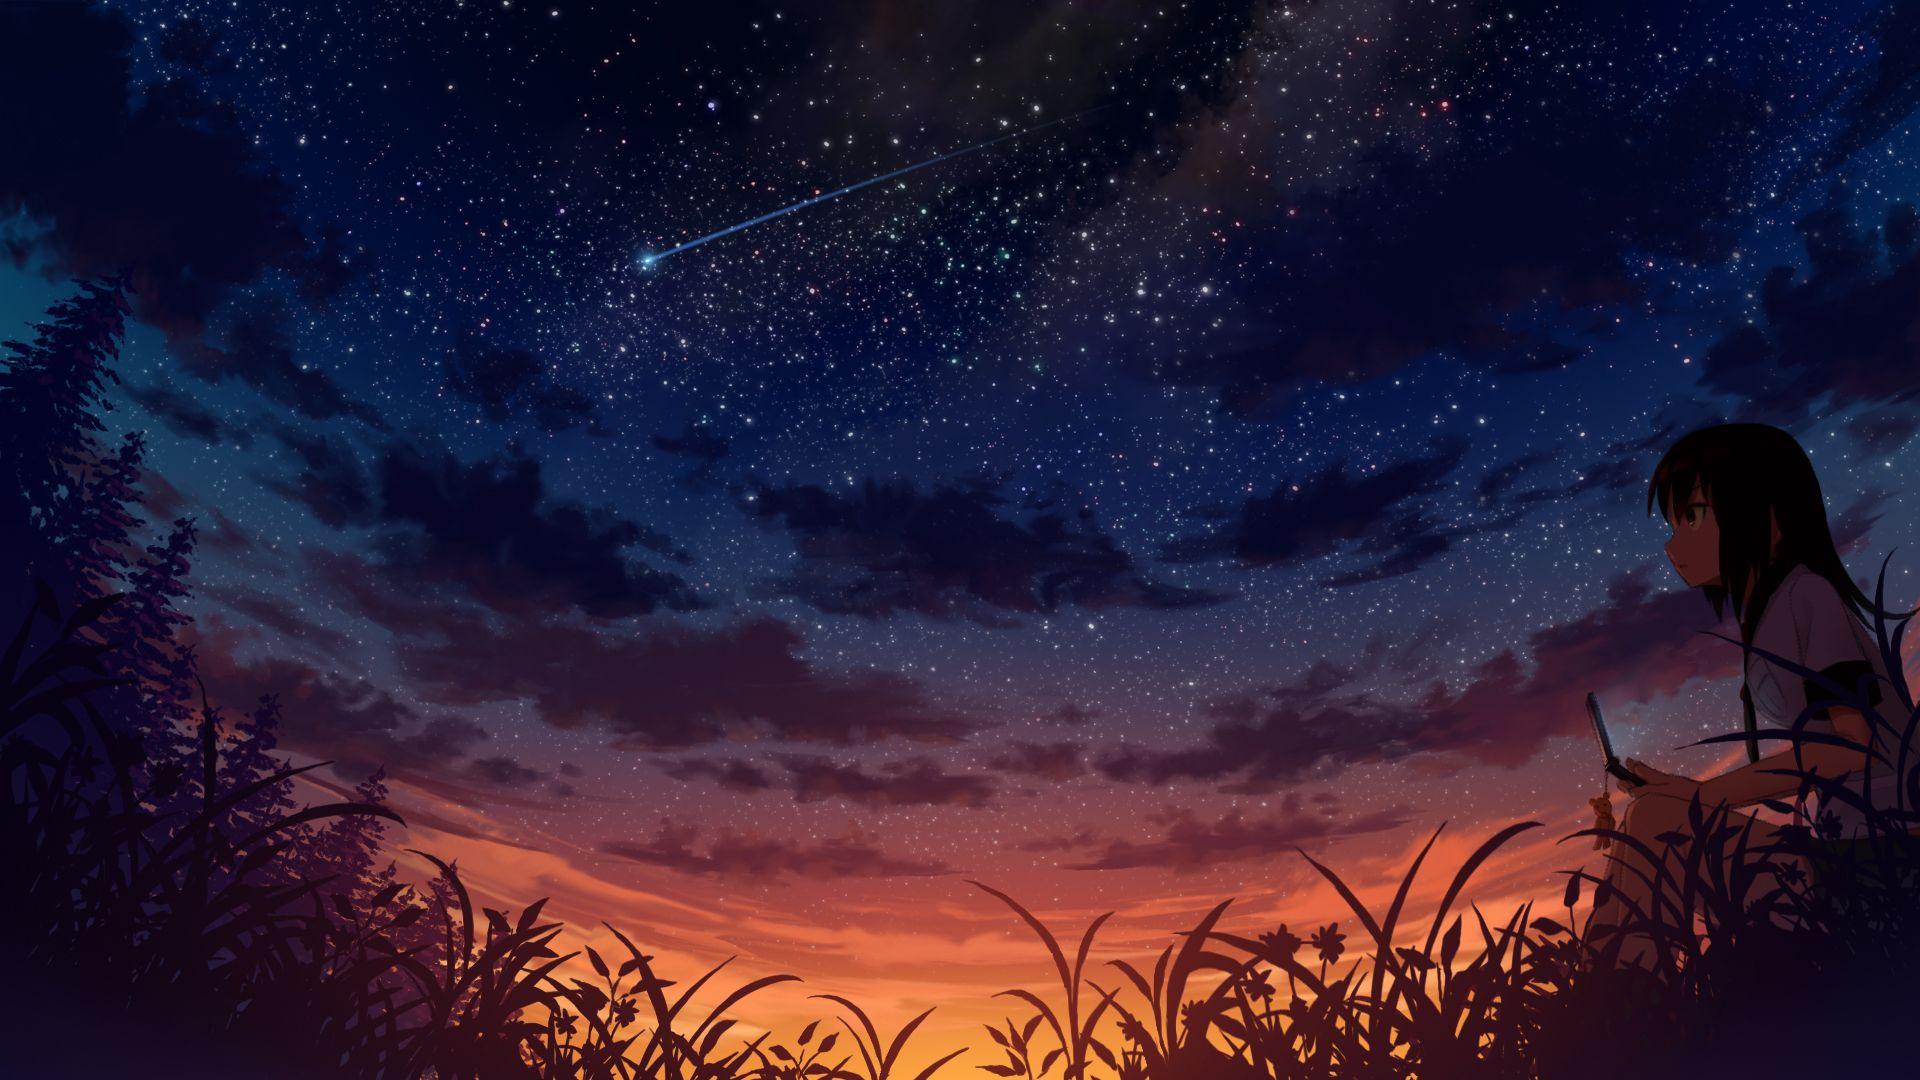 42274 Anime Scenery Starry Sky Jpg 1920 1080 Scenery Wallpaper Sky Anime Anime Scenery